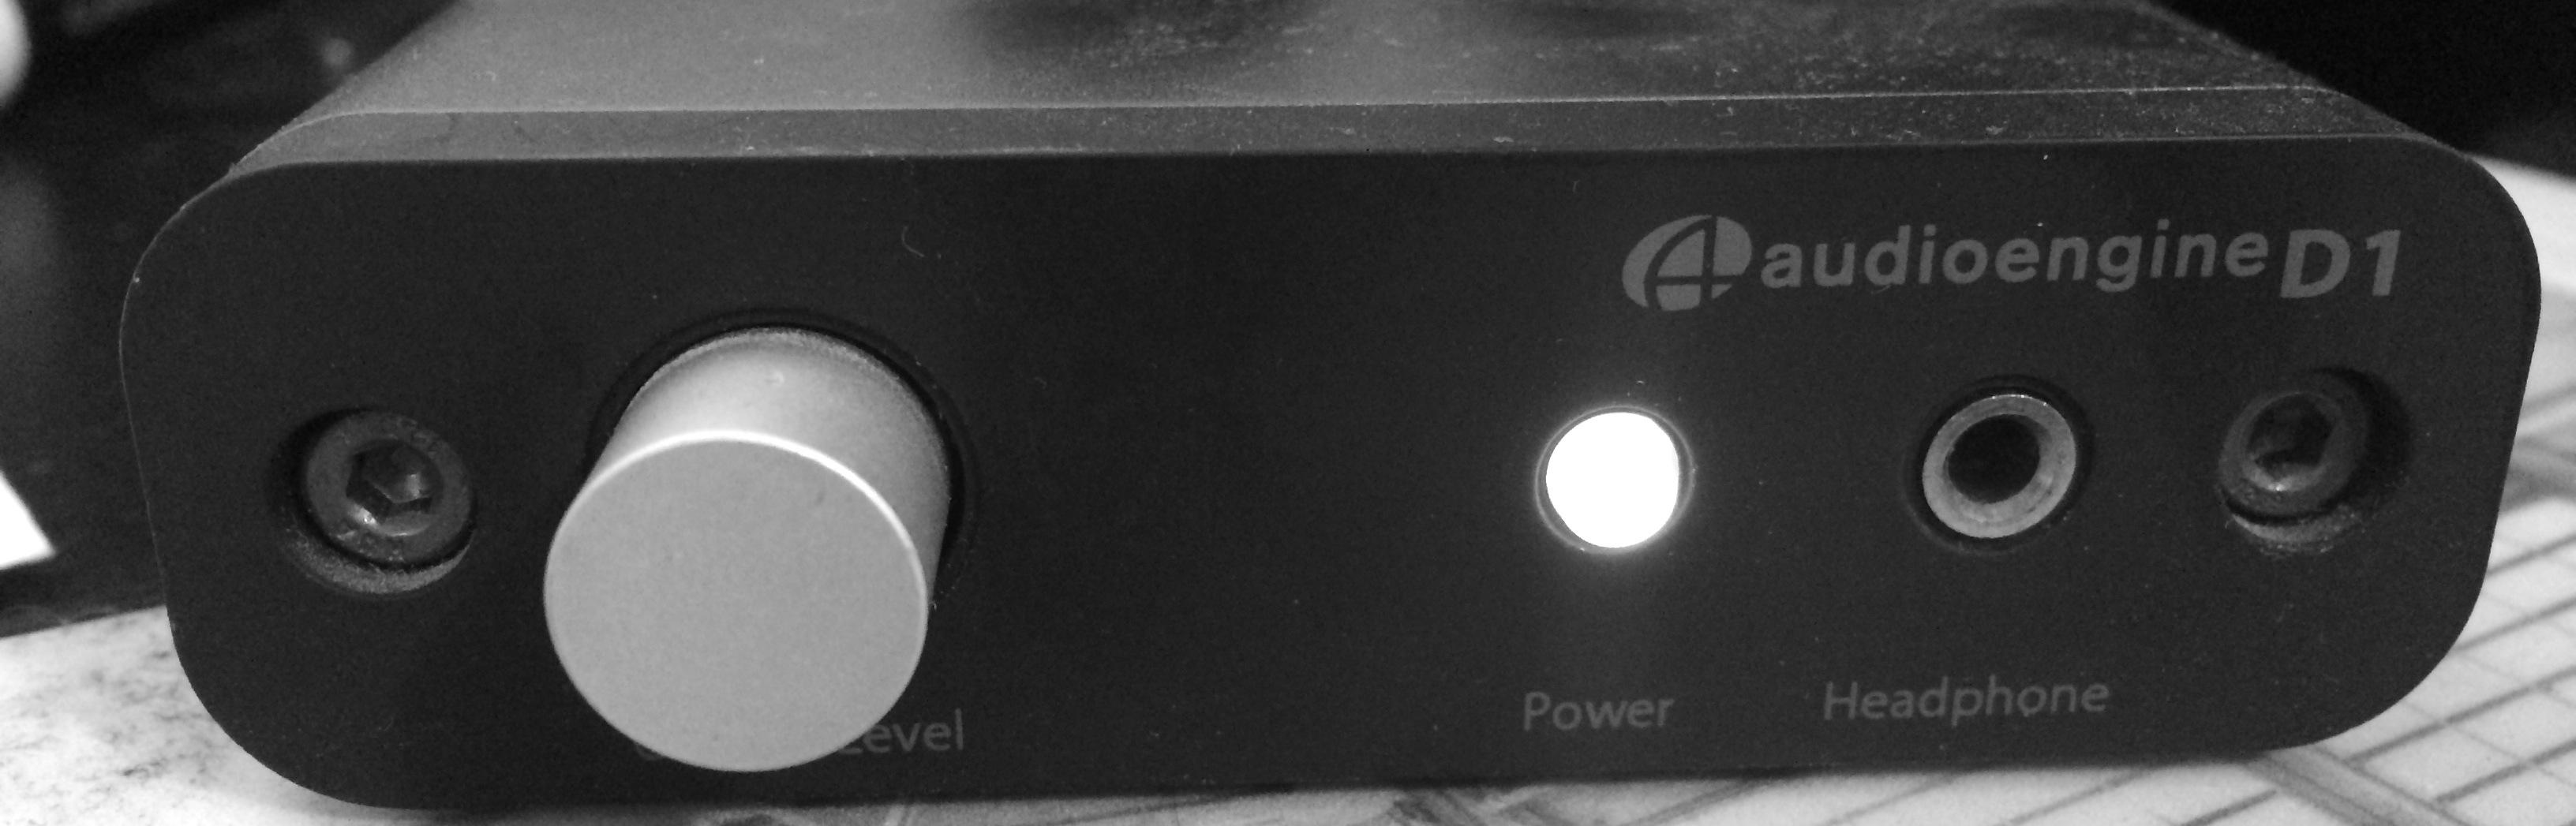 Tech For Life [TFL] #2:  Digital-to Analog-Headphone Amplifier